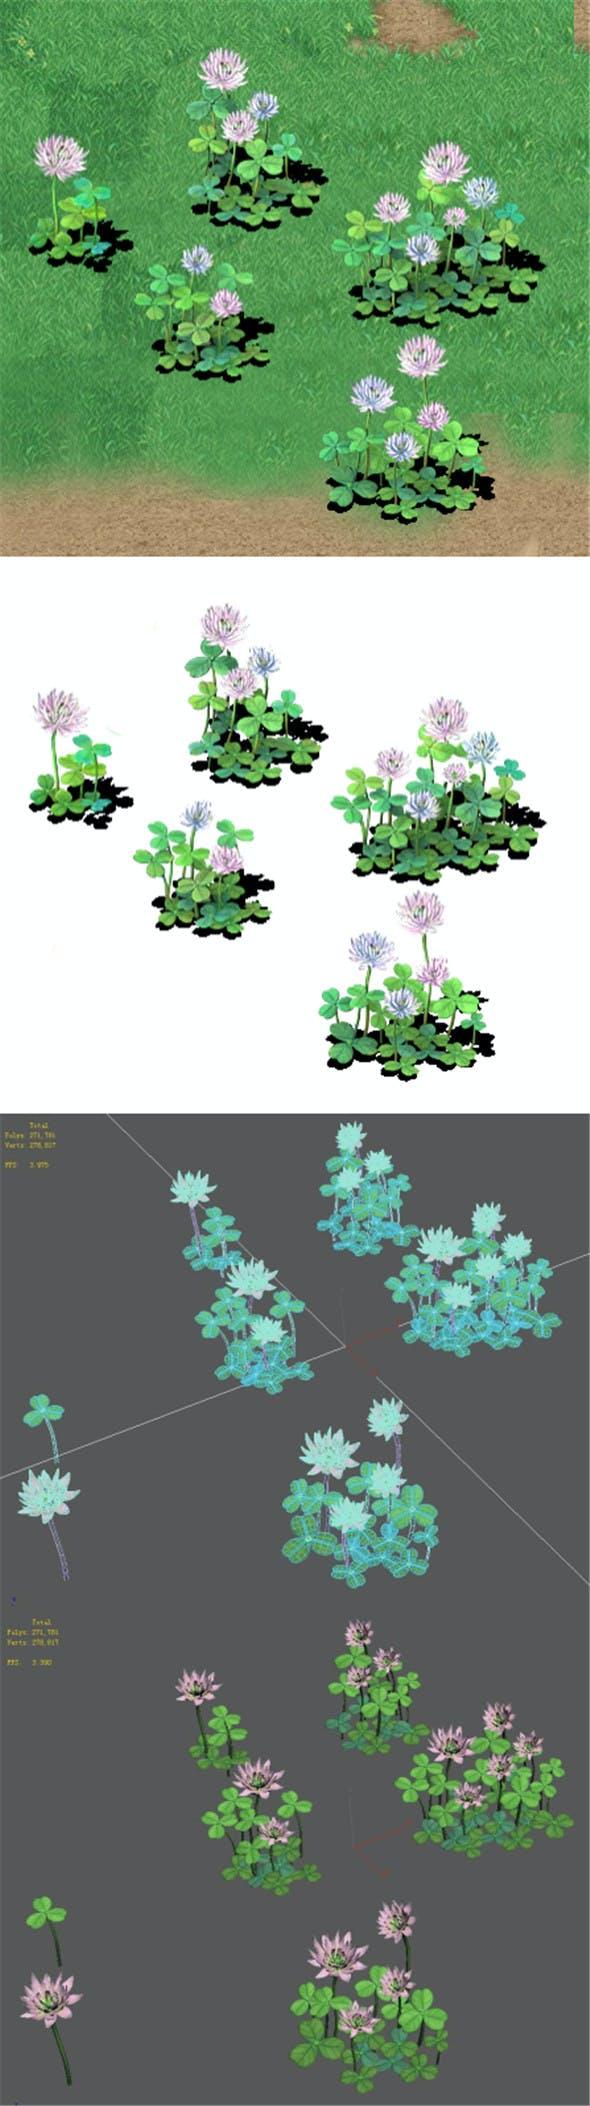 Cartoon version - clover - 3DOcean Item for Sale